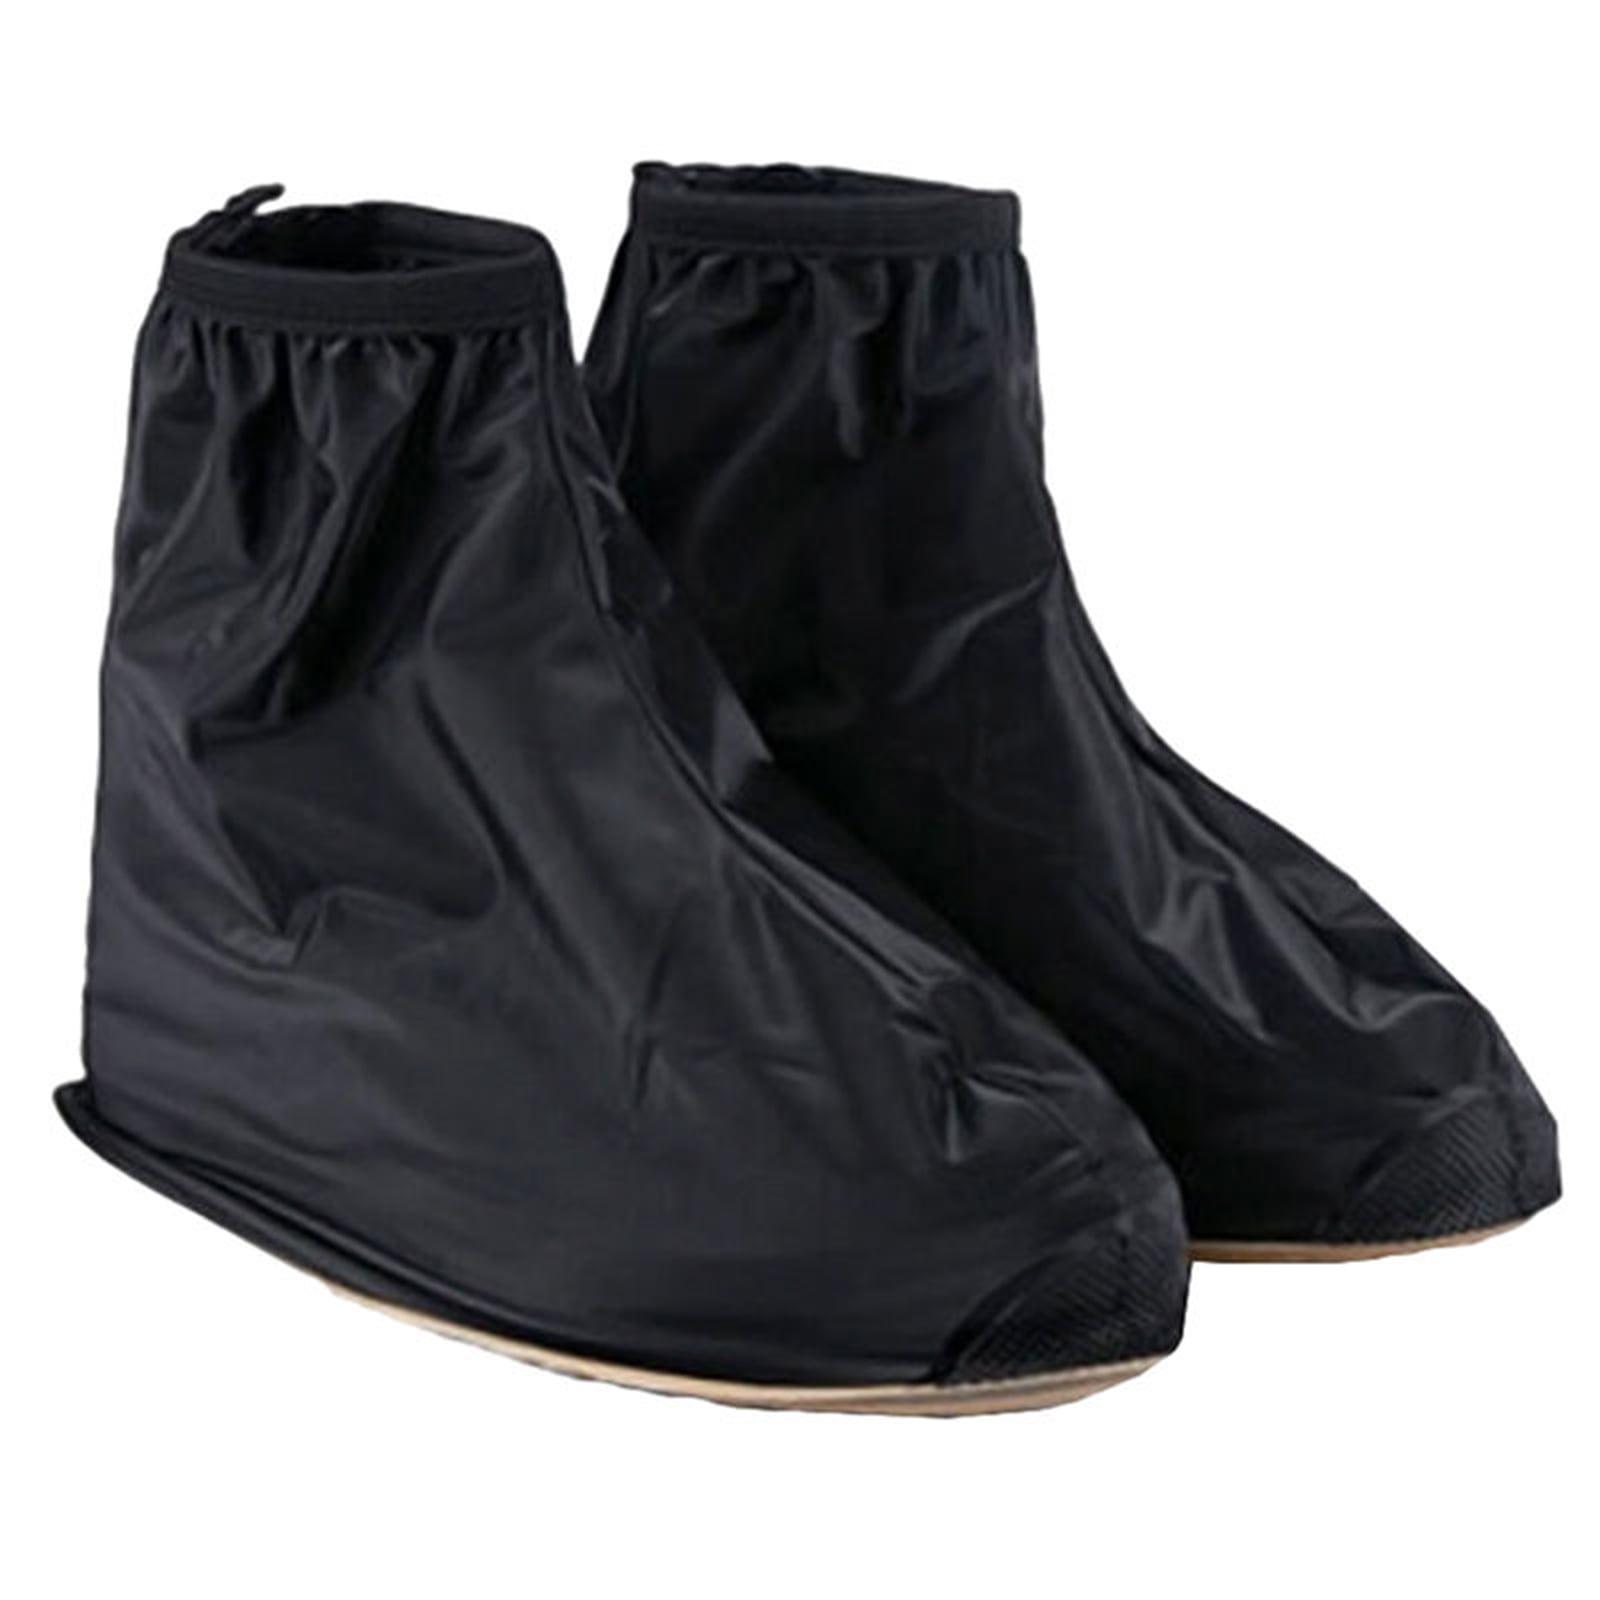 Men Reusable Shoe Covers Flat Waterproof Overshoes Rain Boot Rain Gear MZ by